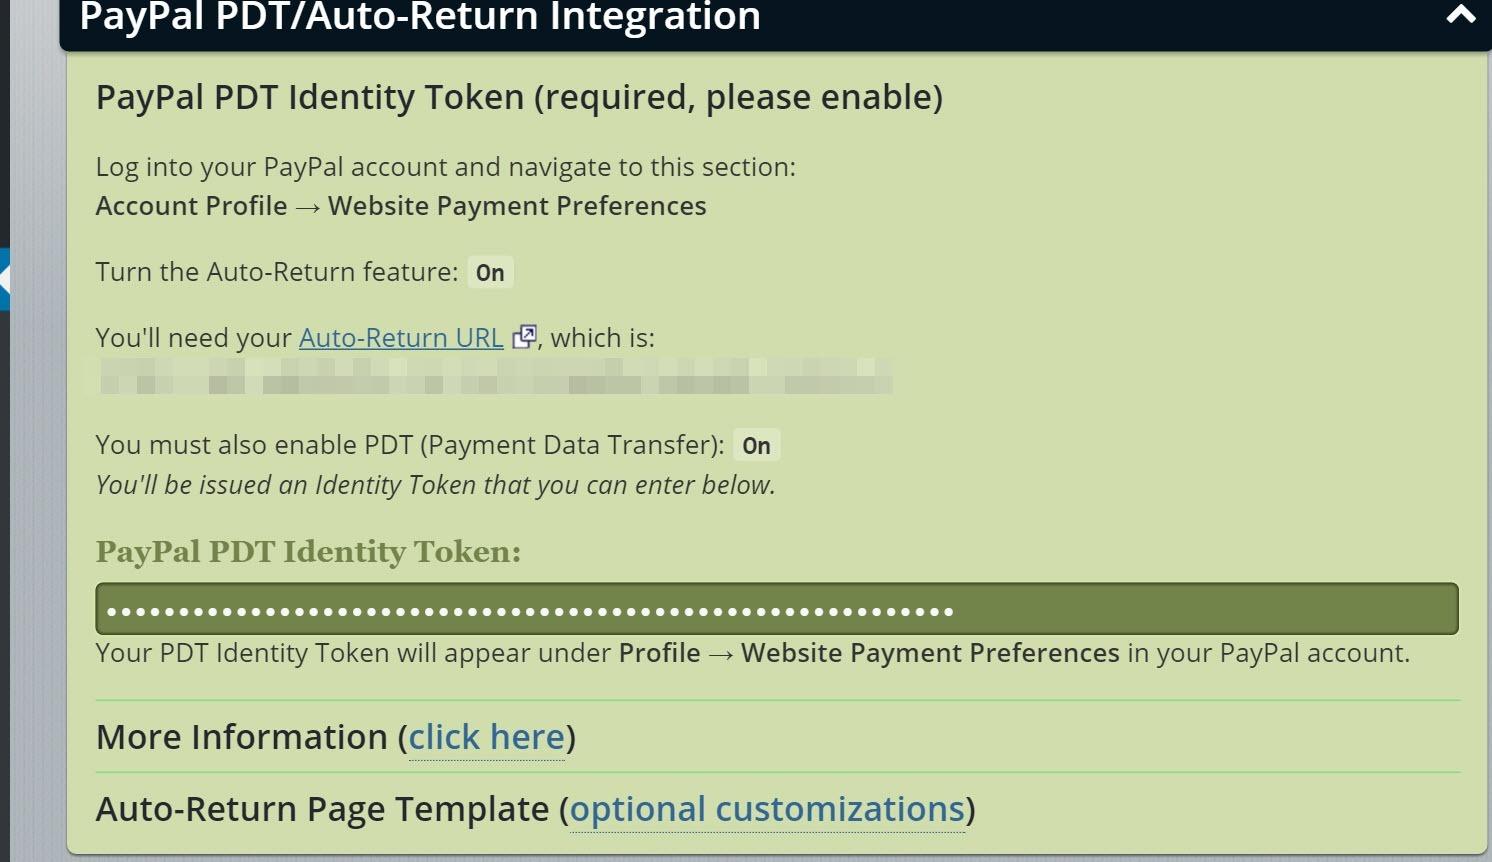 paypal-pdt-auto-return-integration